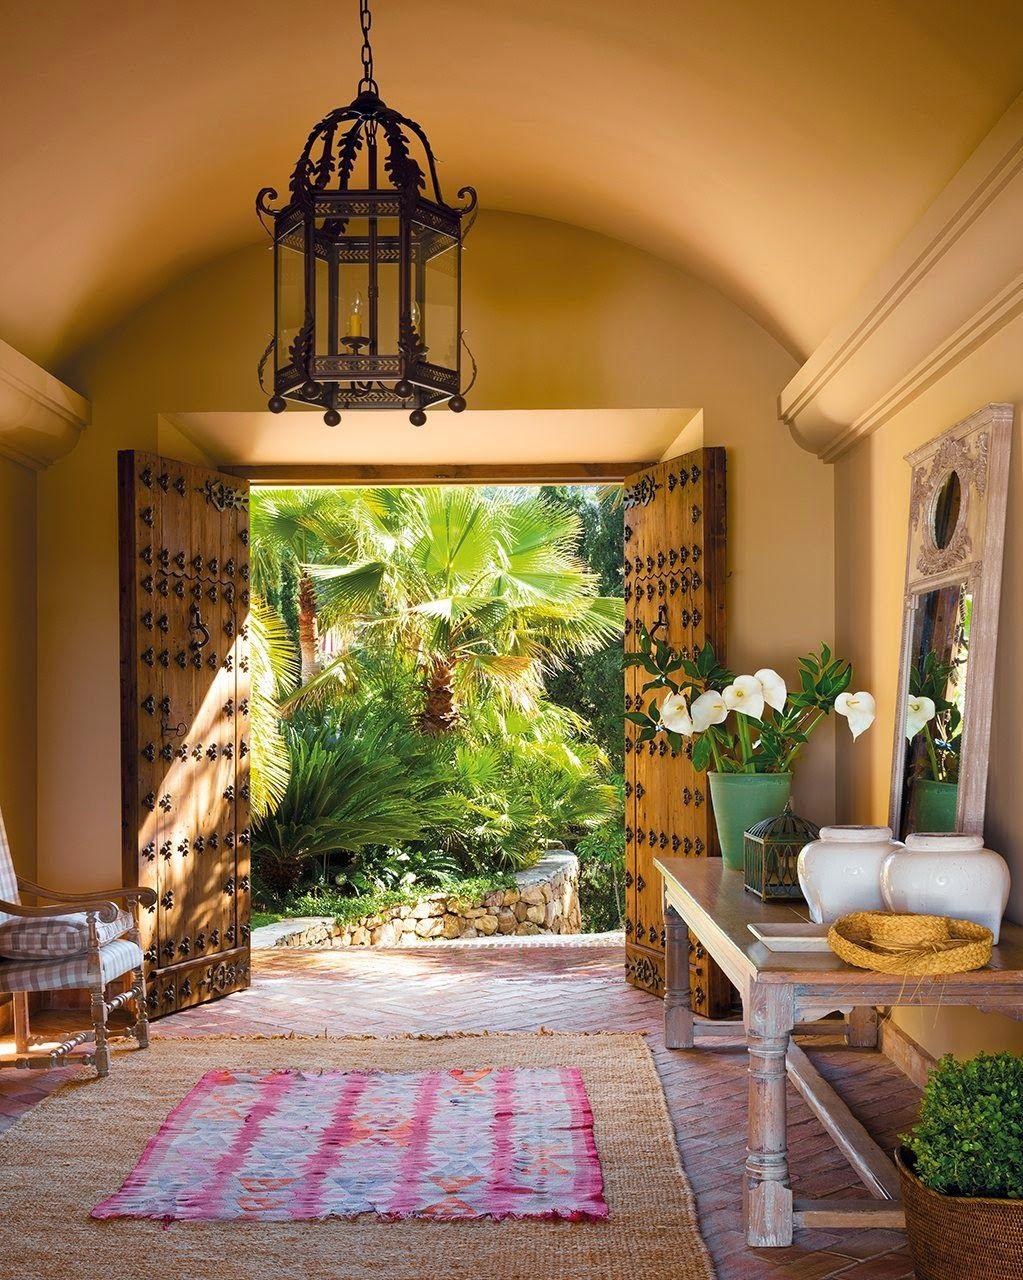 Blog de decoraci n dise o de interiores ideas for Puertas decorativas para interiores